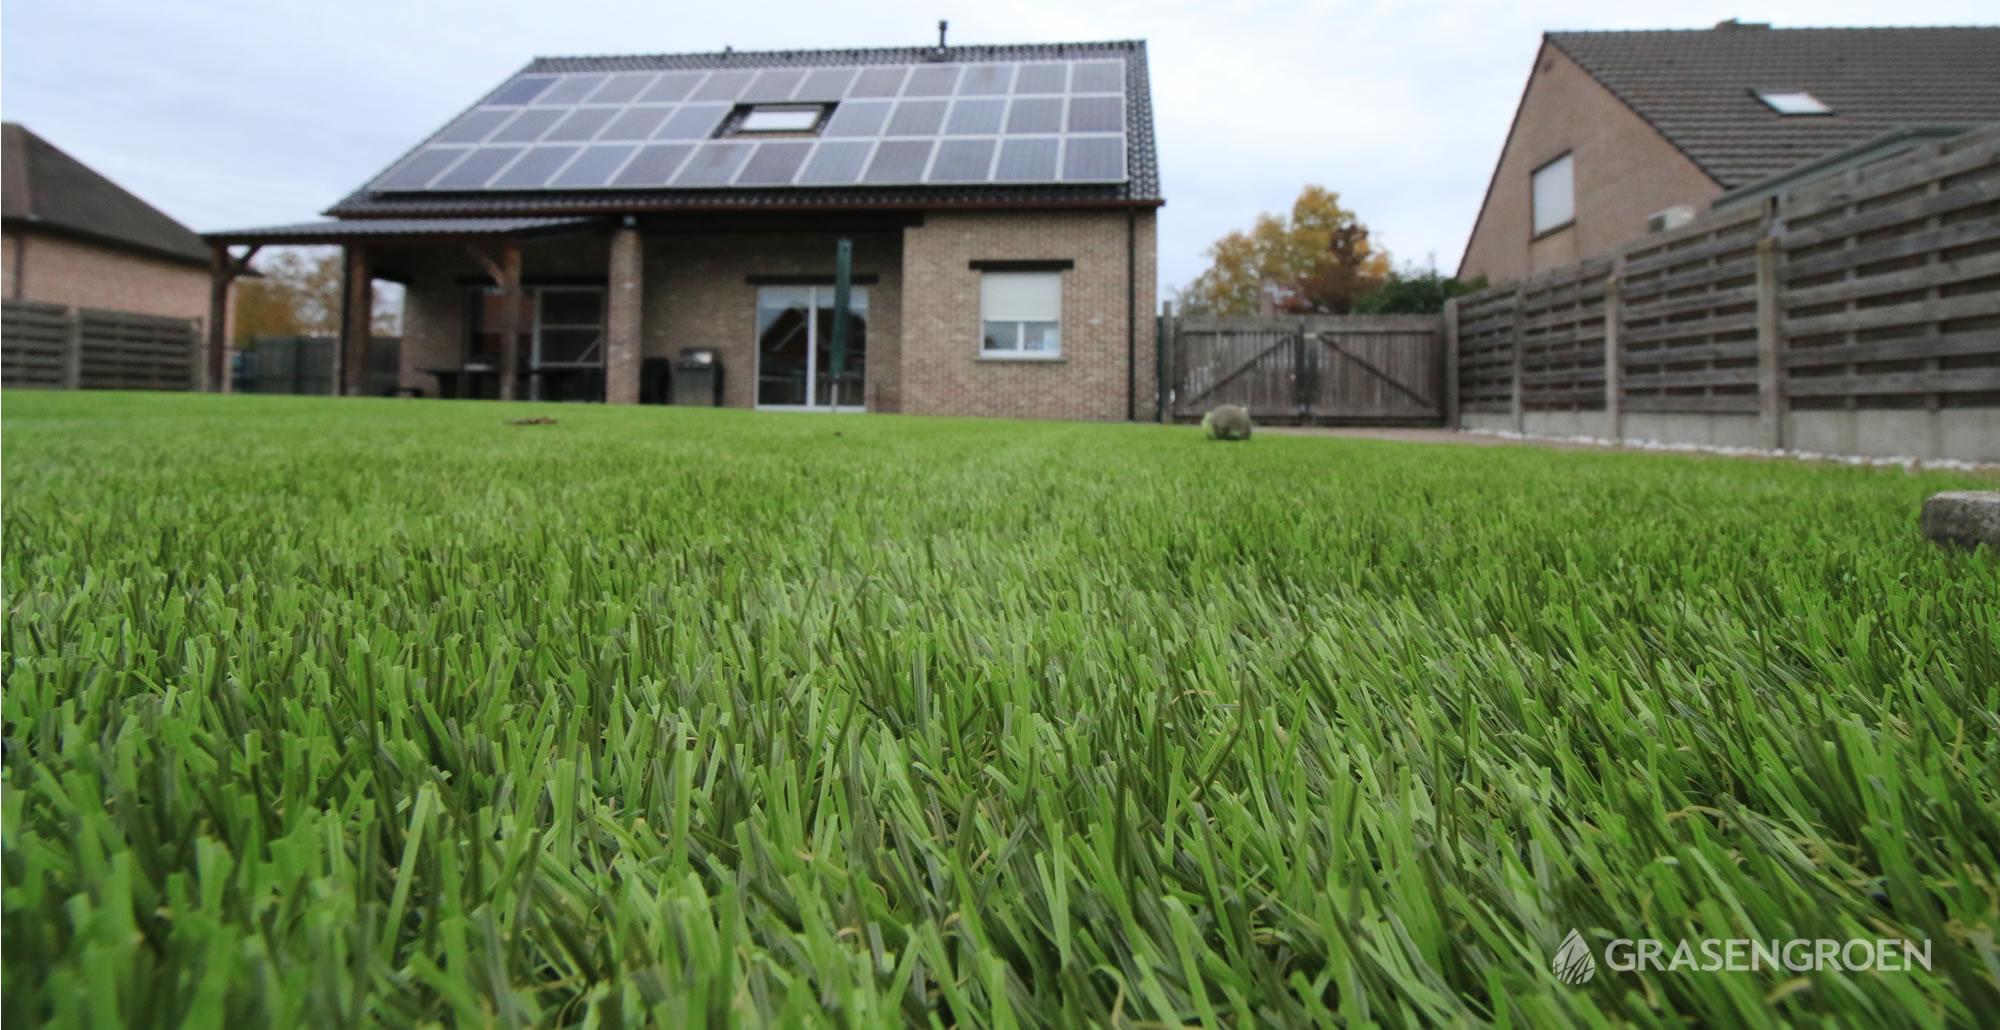 Kunstgrasleggenzelem11 • Gras en Groen Kunstgras